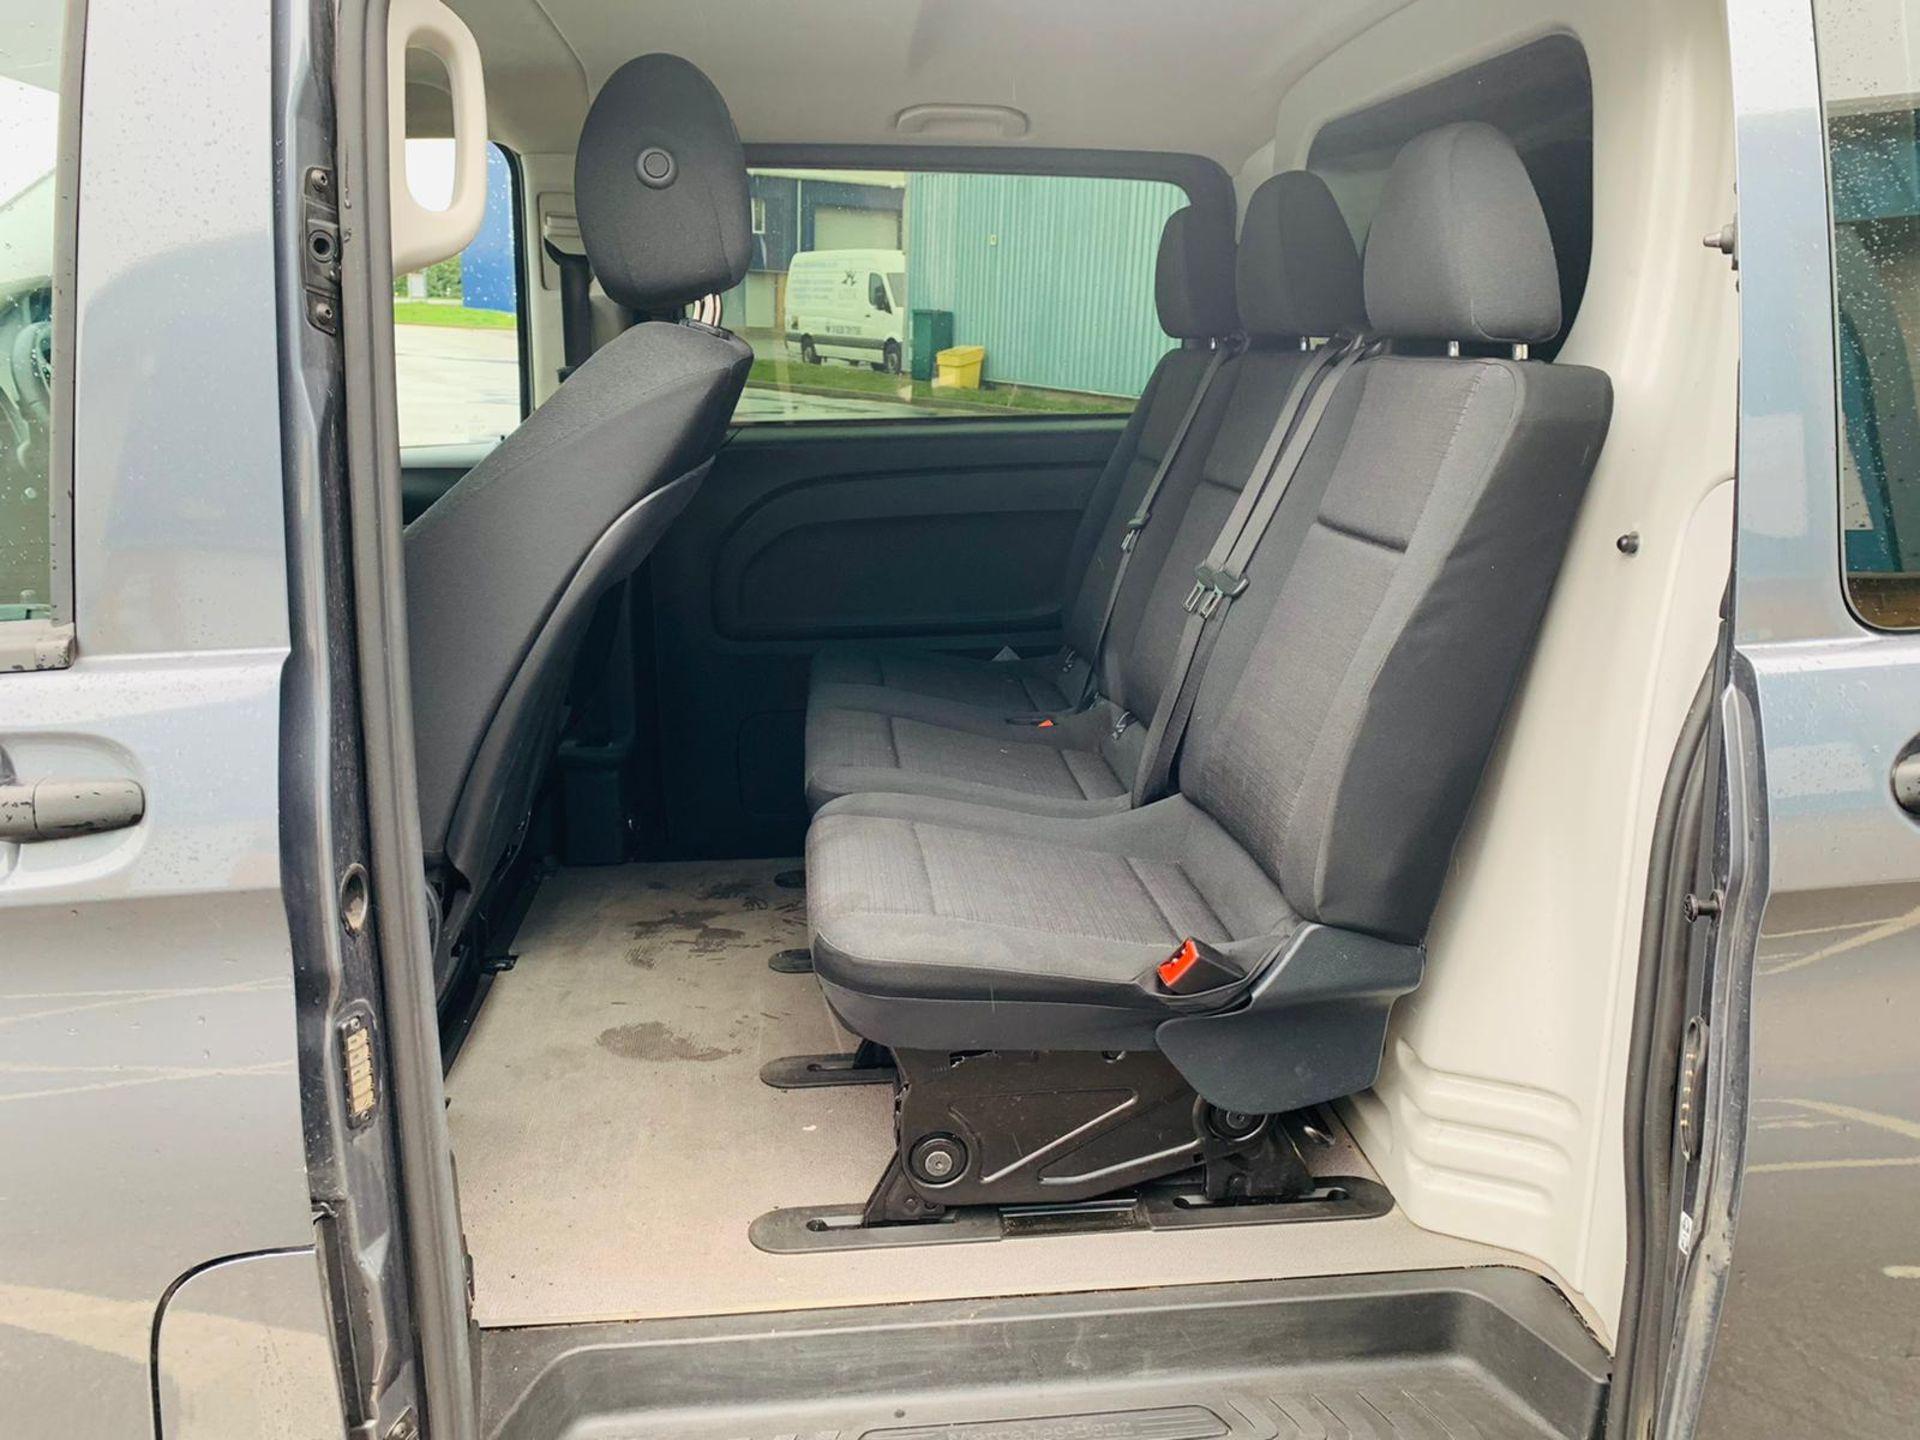 Mercedes Vito 114 Bluetec Dualiner/Crew Van - Auto - Air Con - 2018 18 Reg - 1 Owner From New - Image 9 of 25